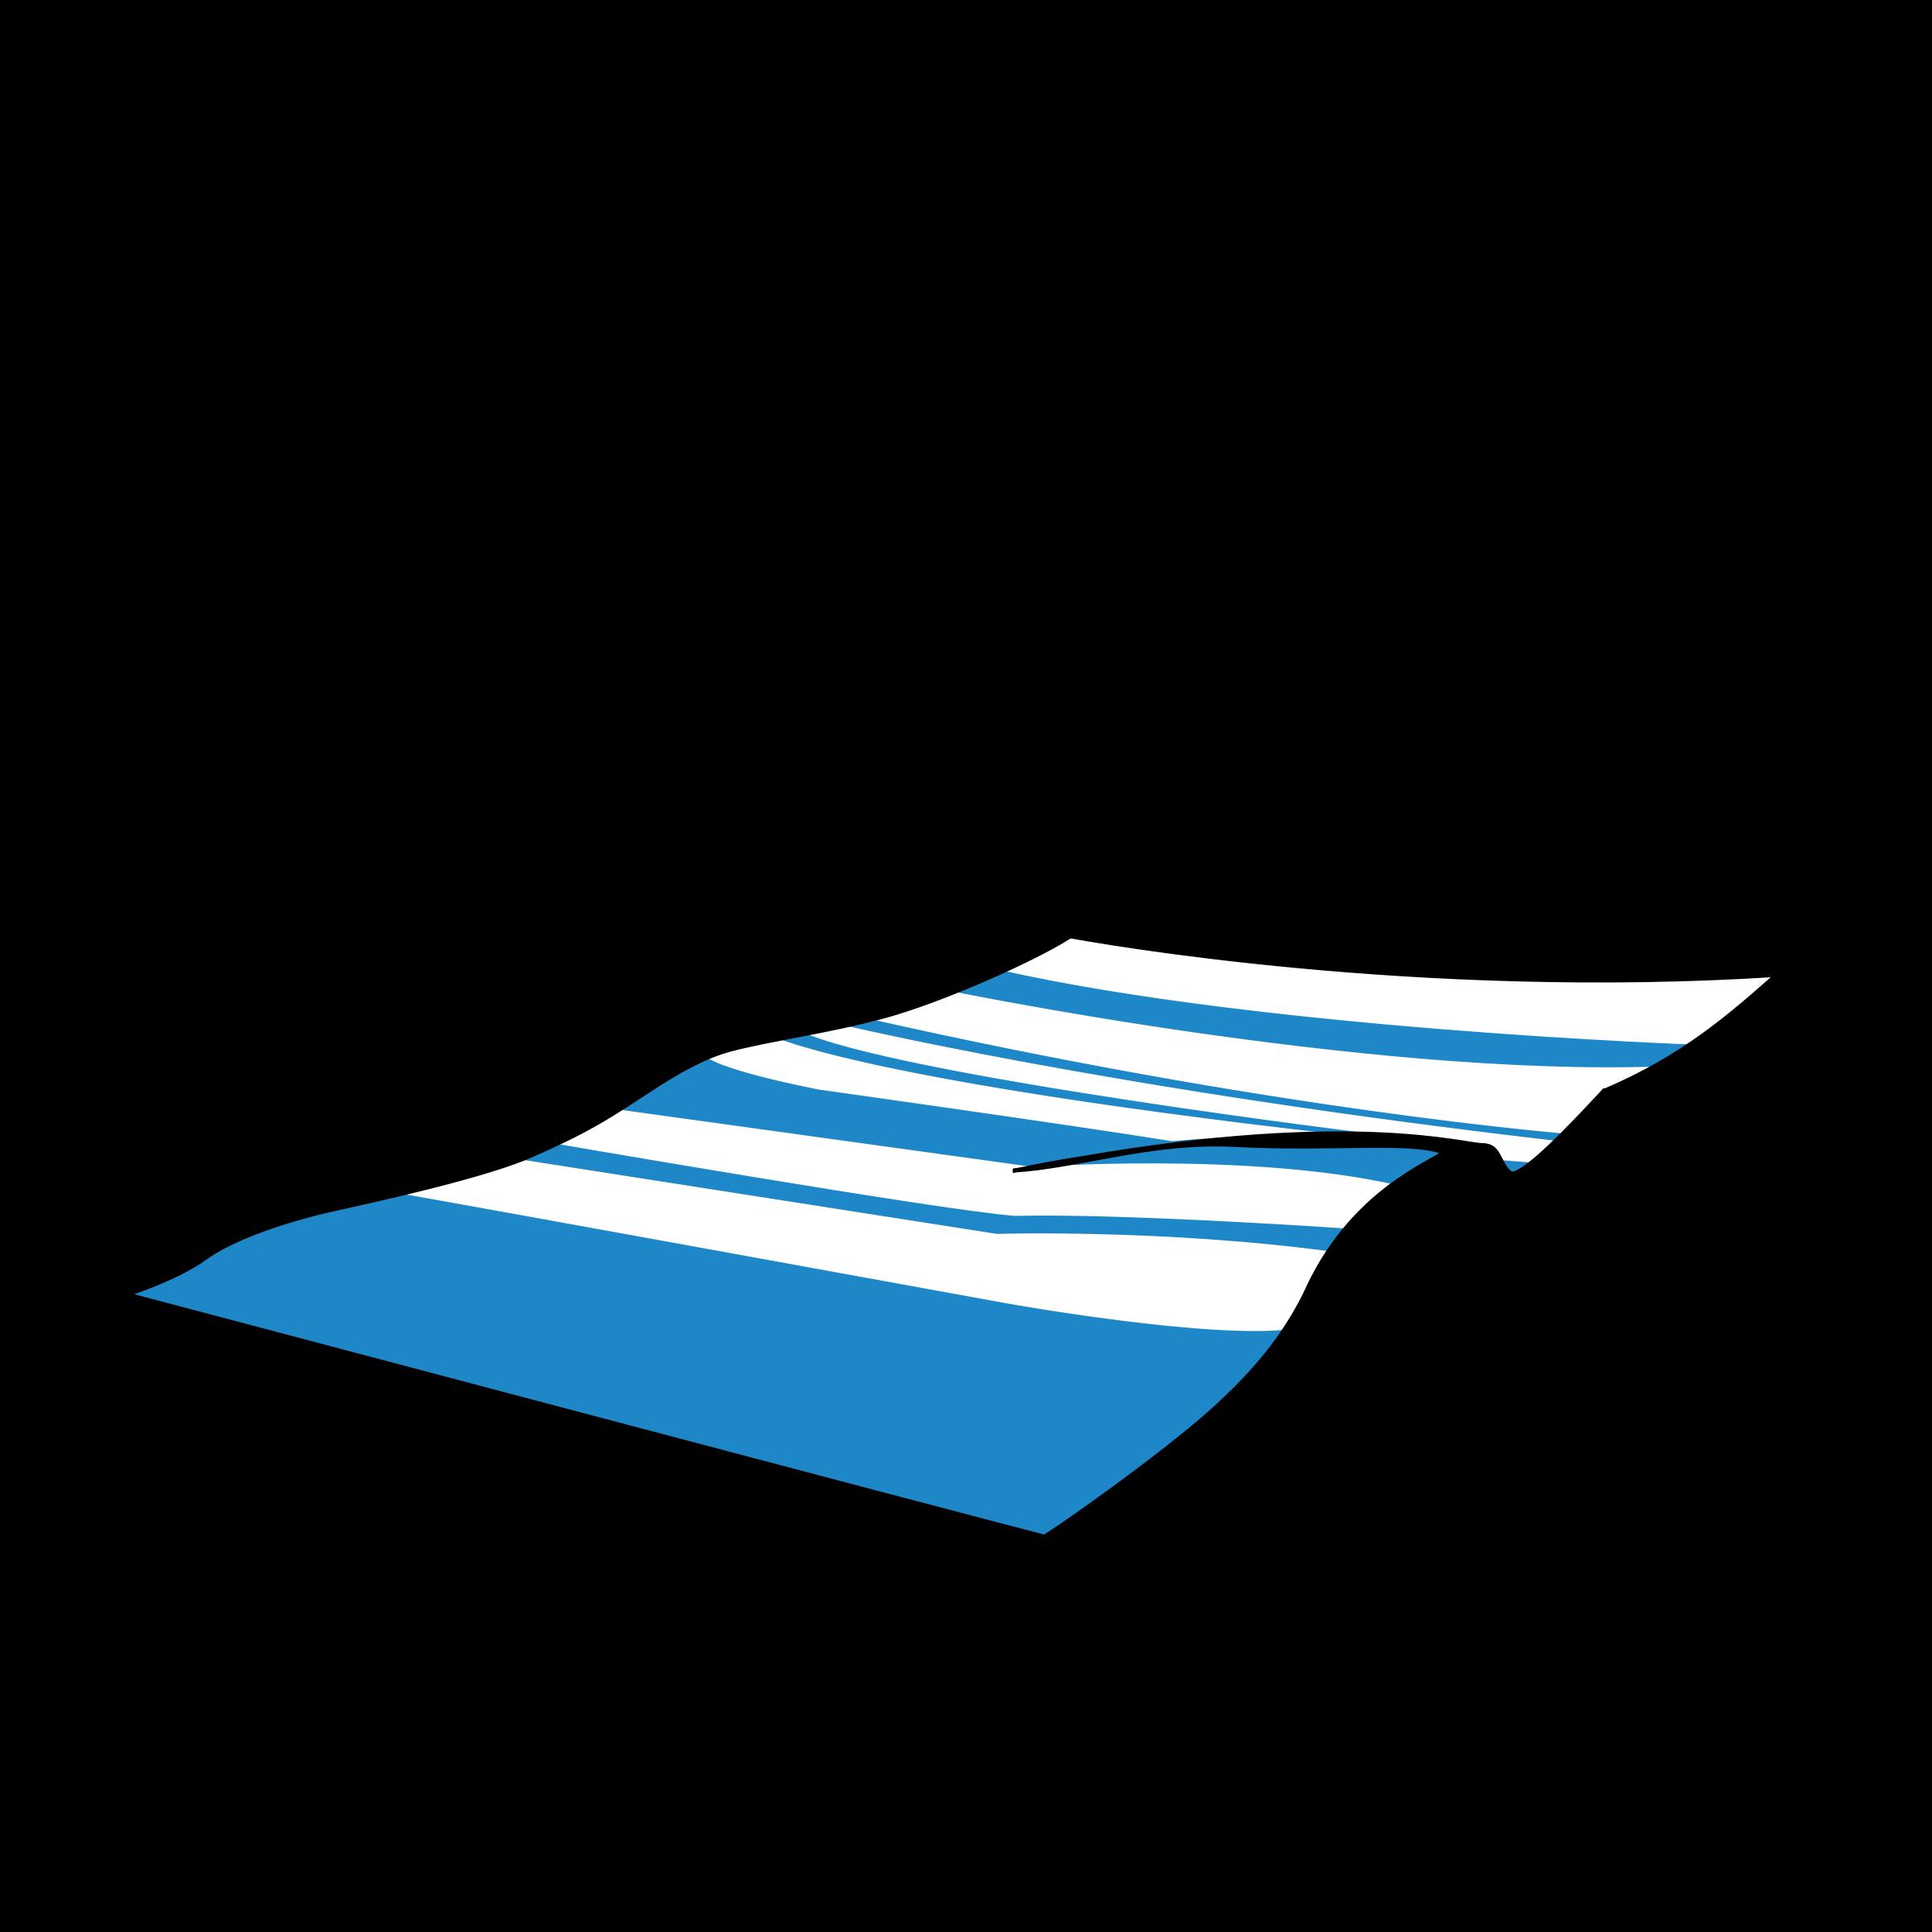 Beach Towel Clip Art - Cliparts.co